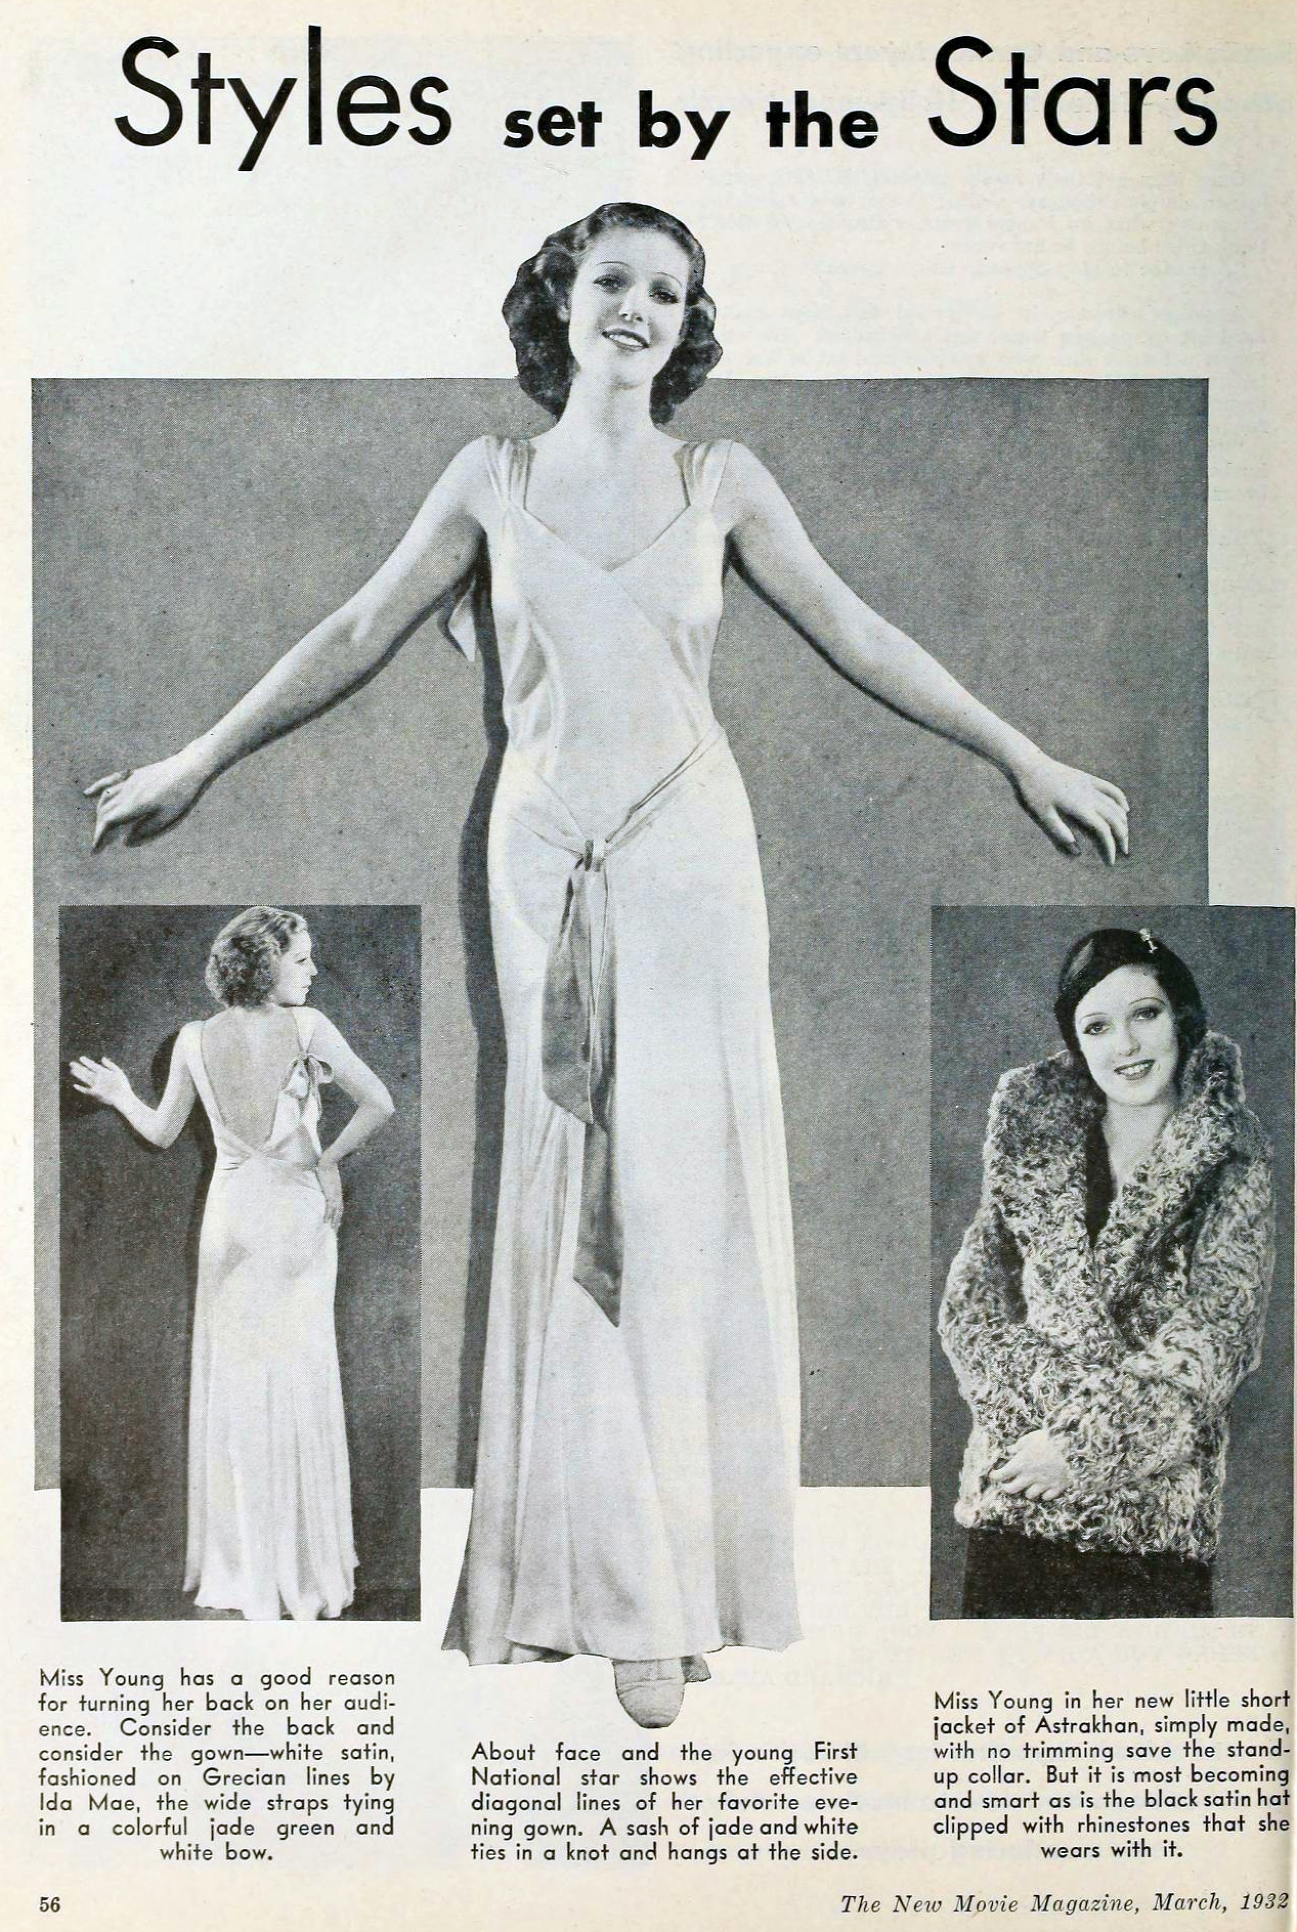 loretta young 00a the new movie magazine march 1932